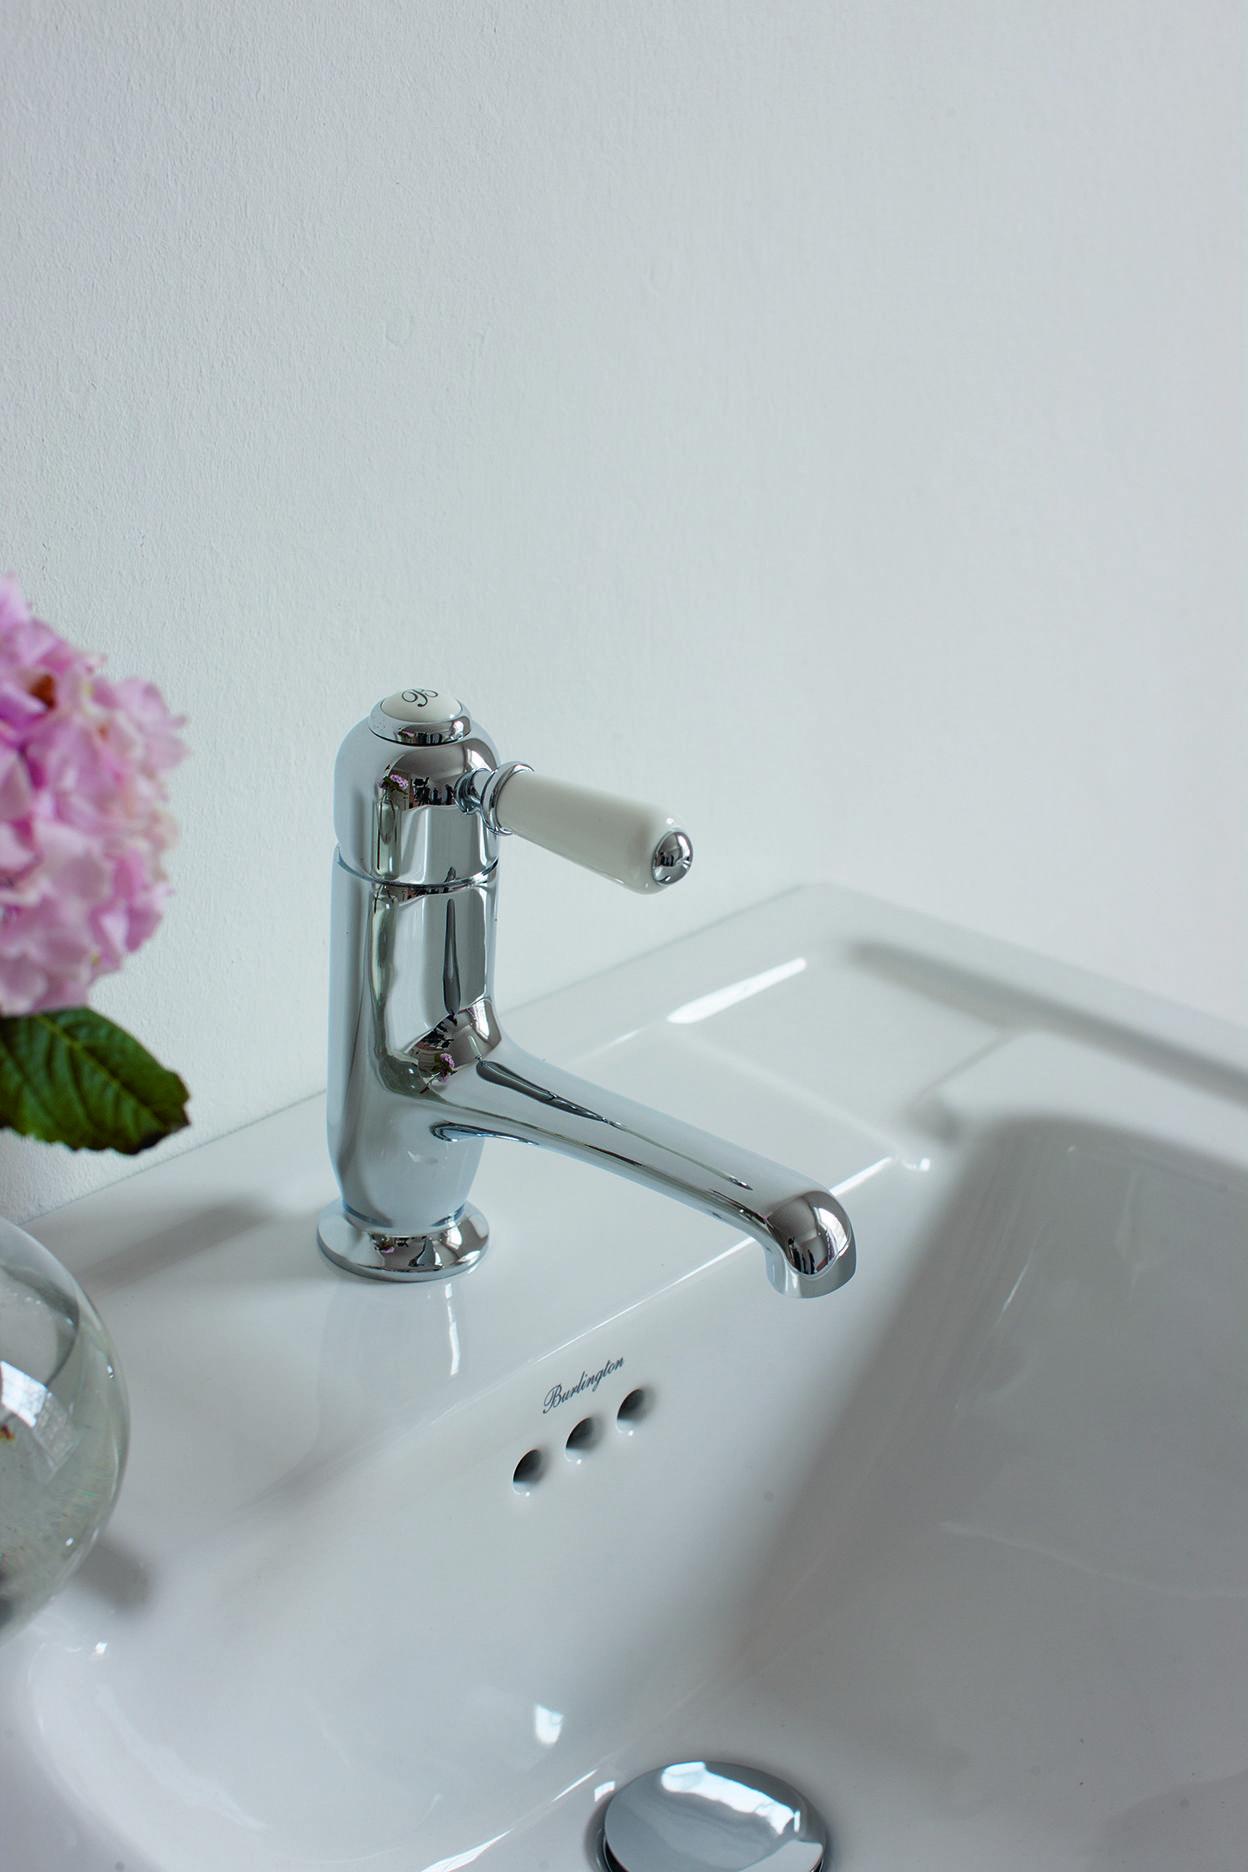 Pin by Burlington Bathrooms on Taps | Pinterest | Basin mixer, Mixer ...